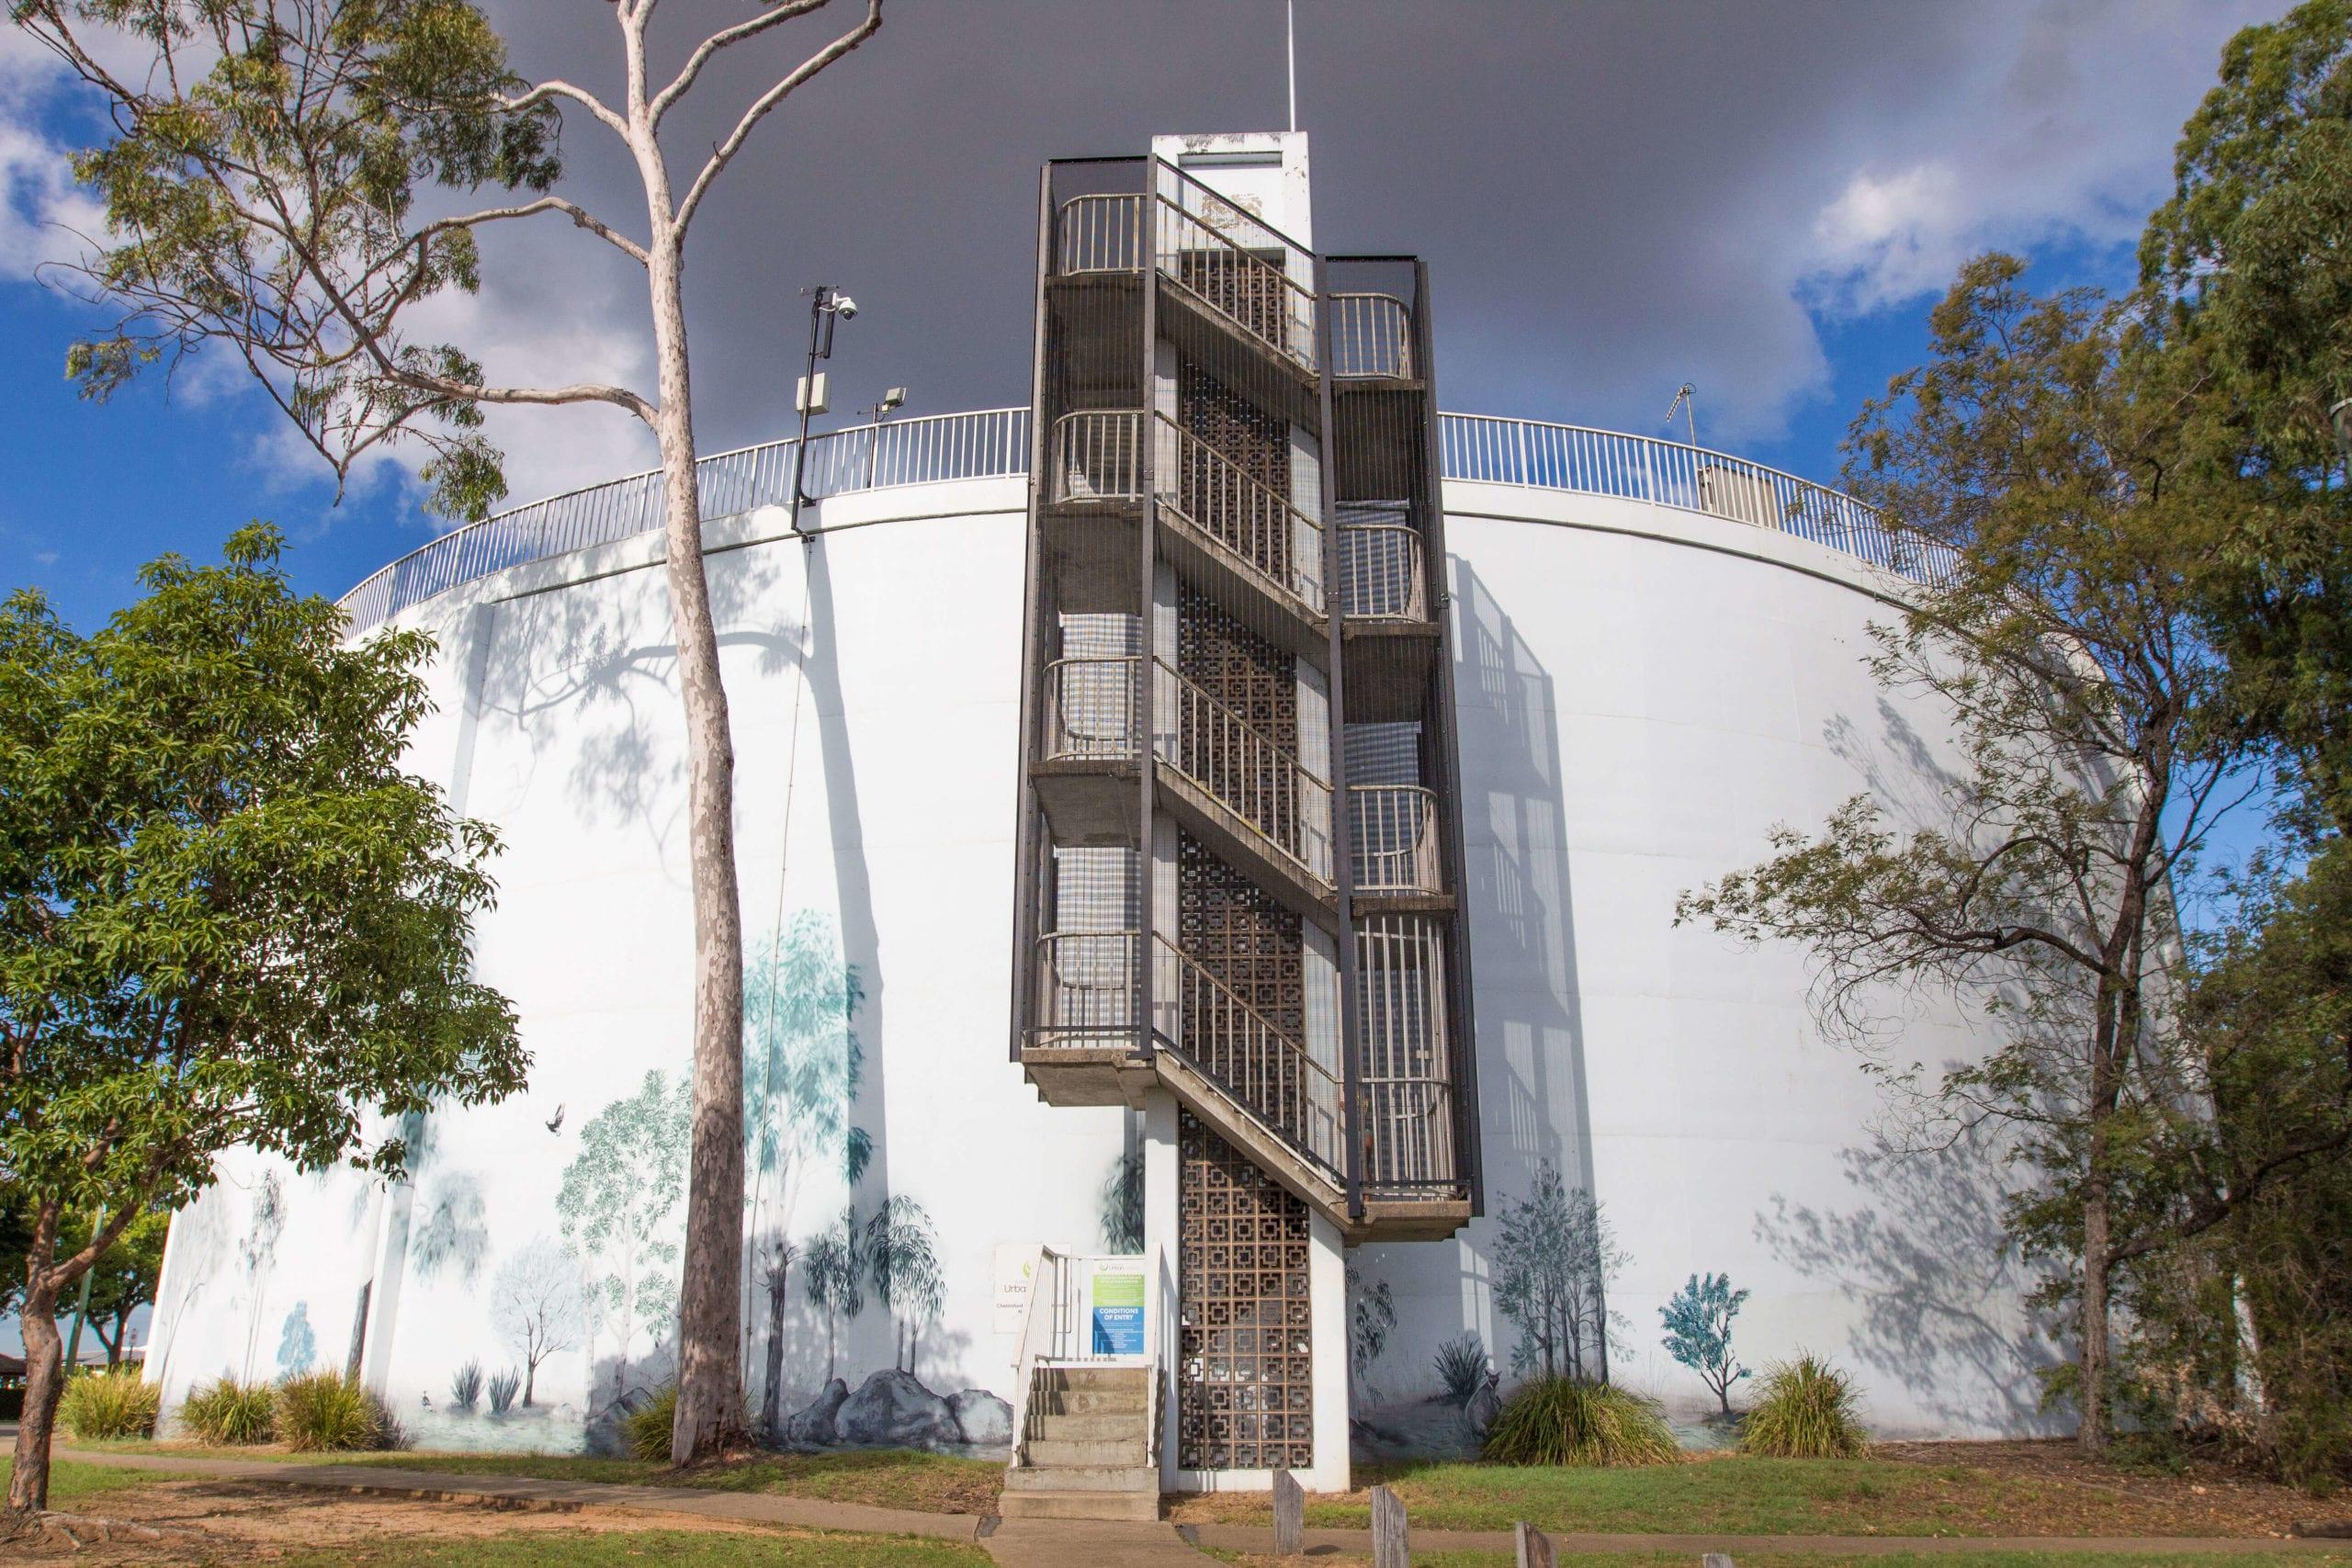 Denmark Hill water tower - Ipswich, Queensland,